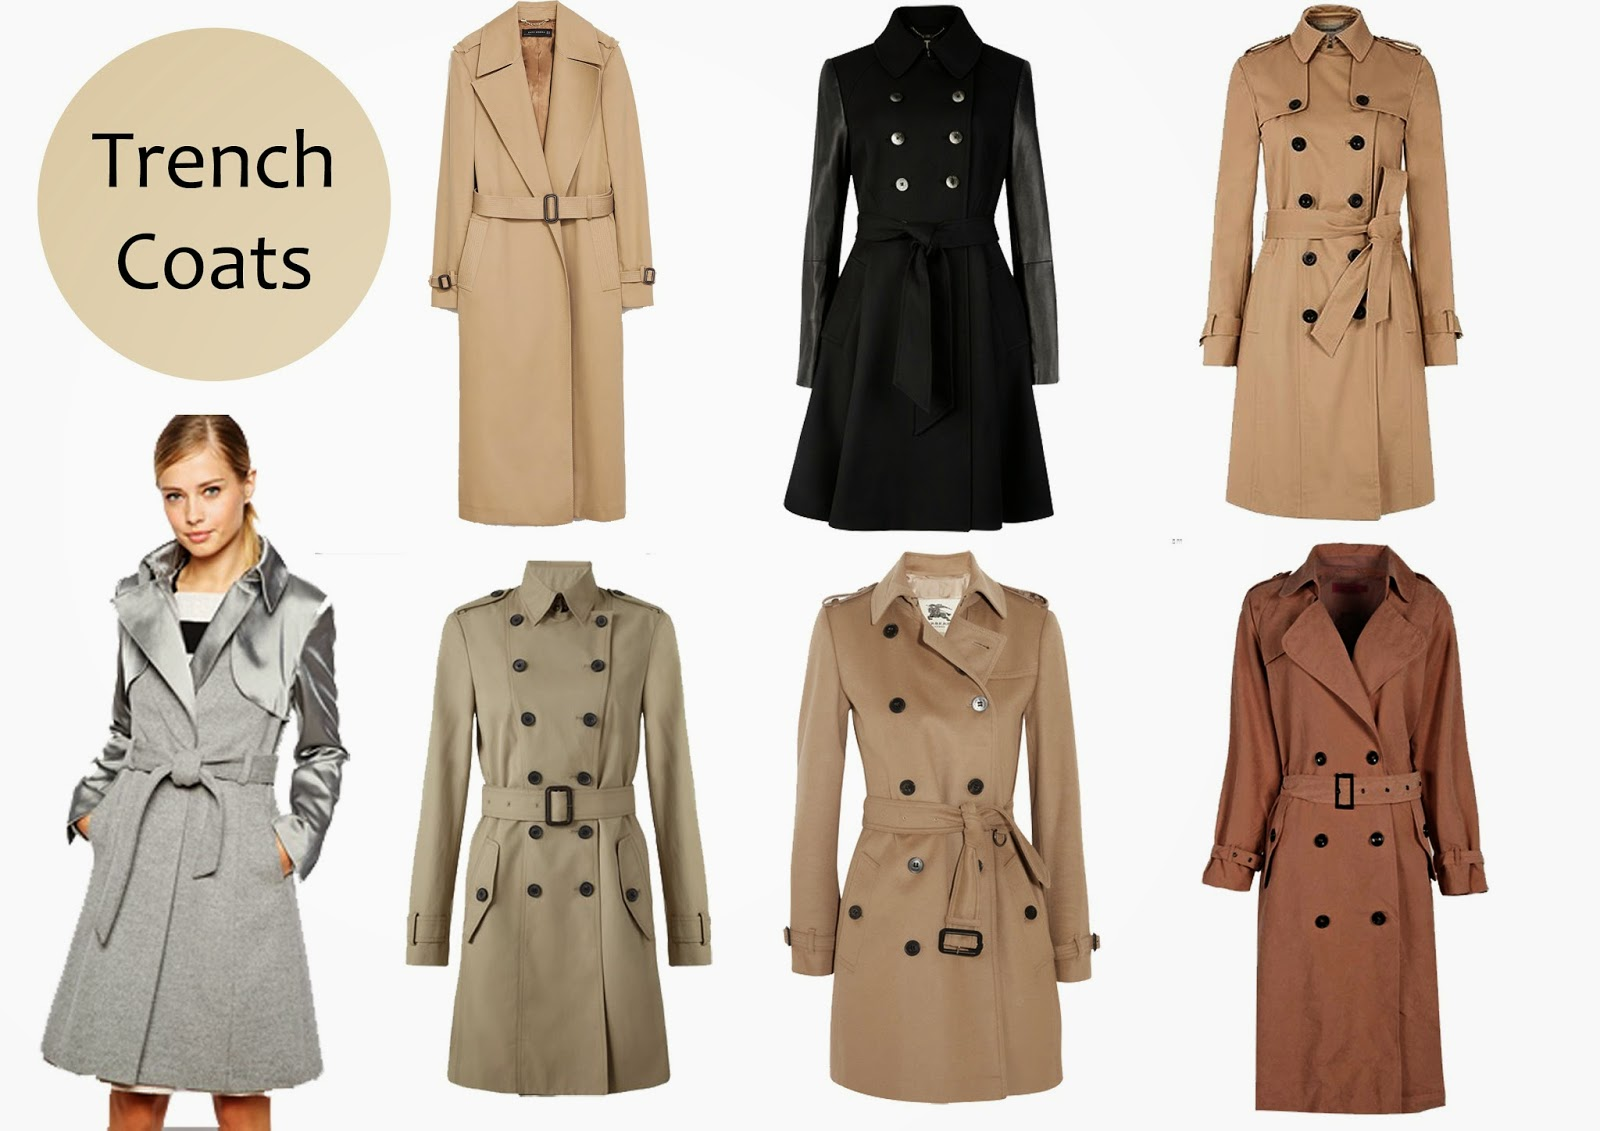 trench femme beige zara camel coat long coat from zara cottonlinen safari jacket le plus. Black Bedroom Furniture Sets. Home Design Ideas